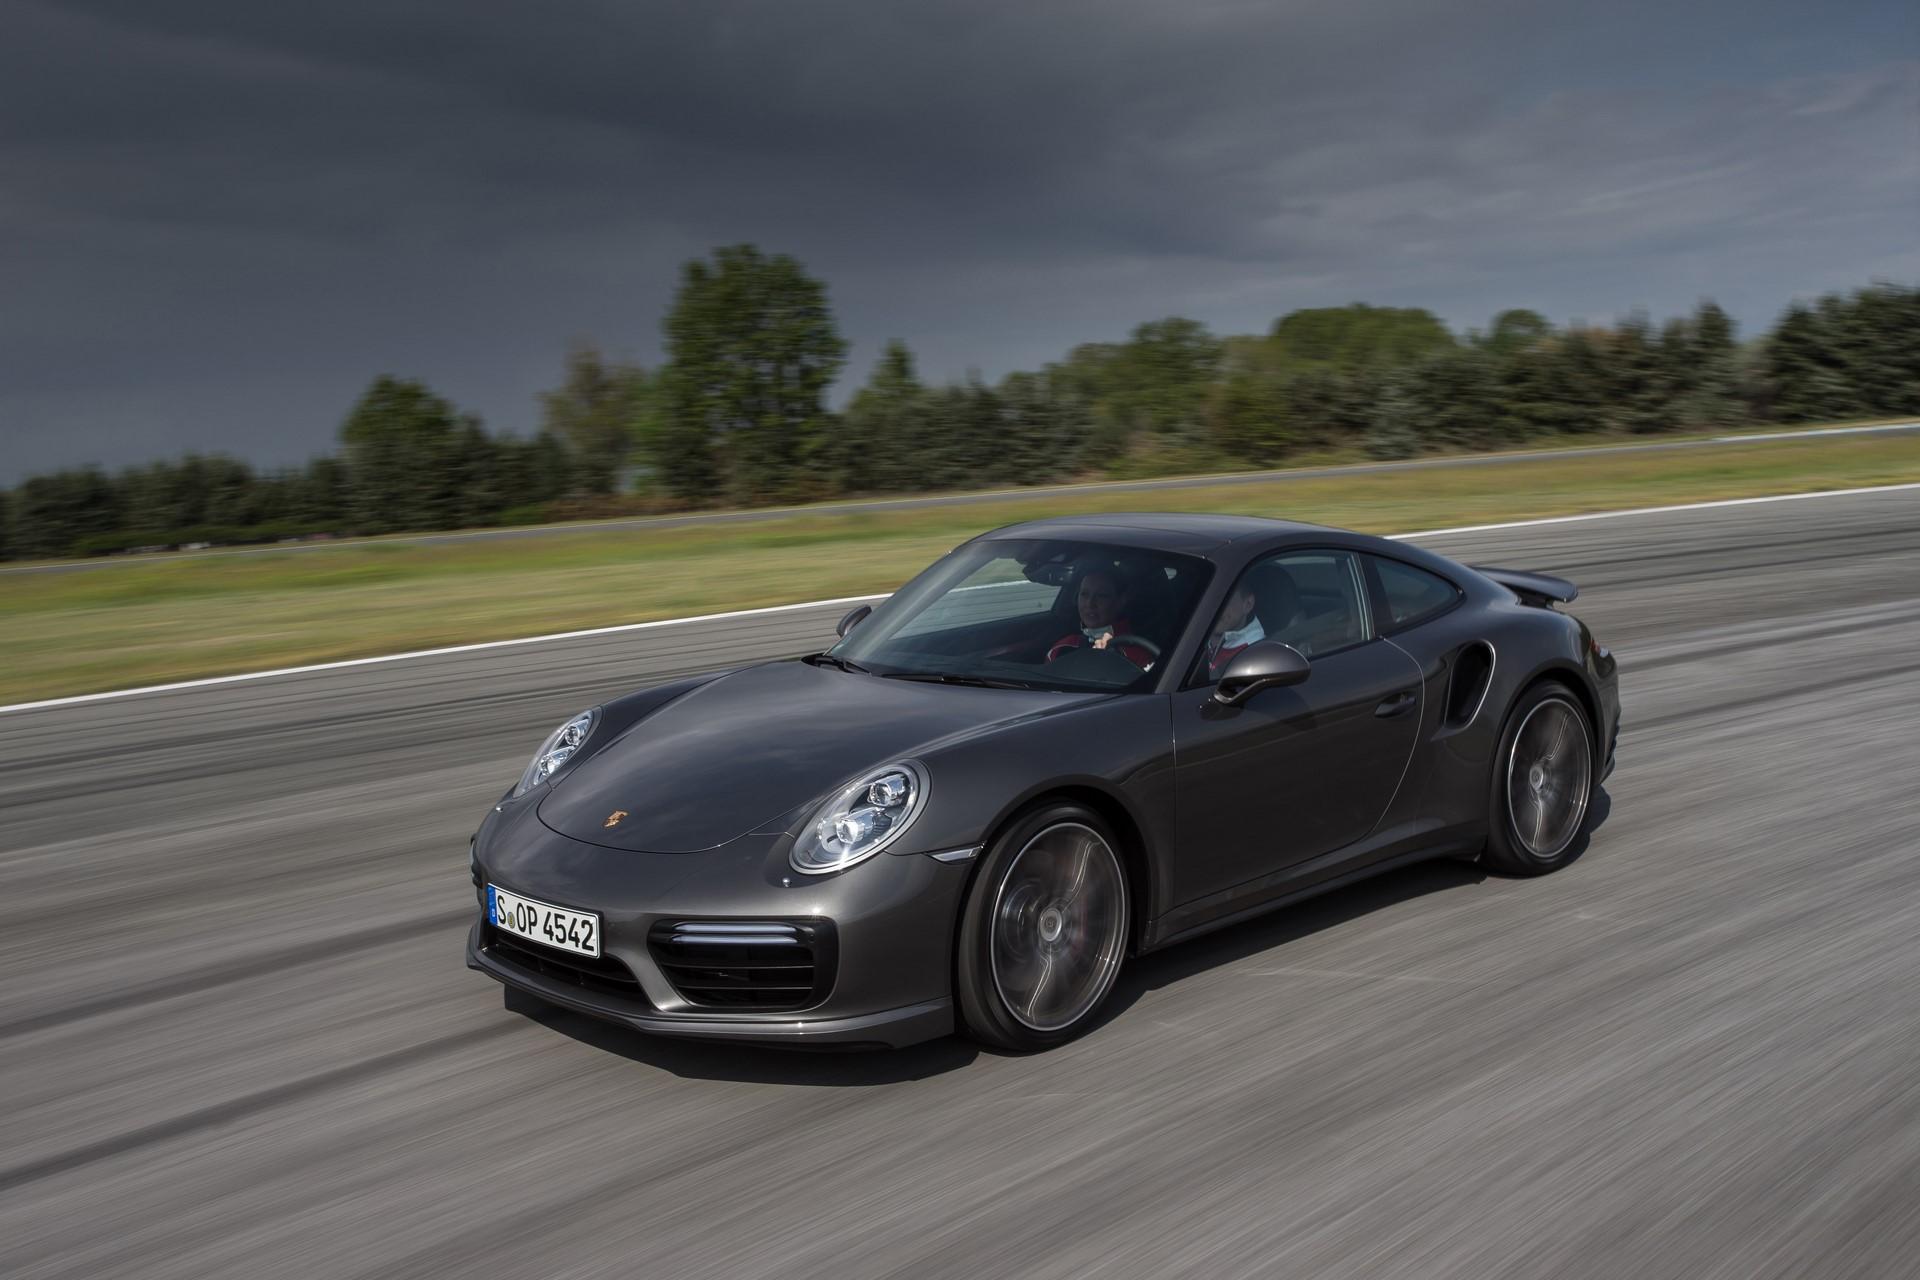 Porsche Driving Experience 2017 Serres (22)